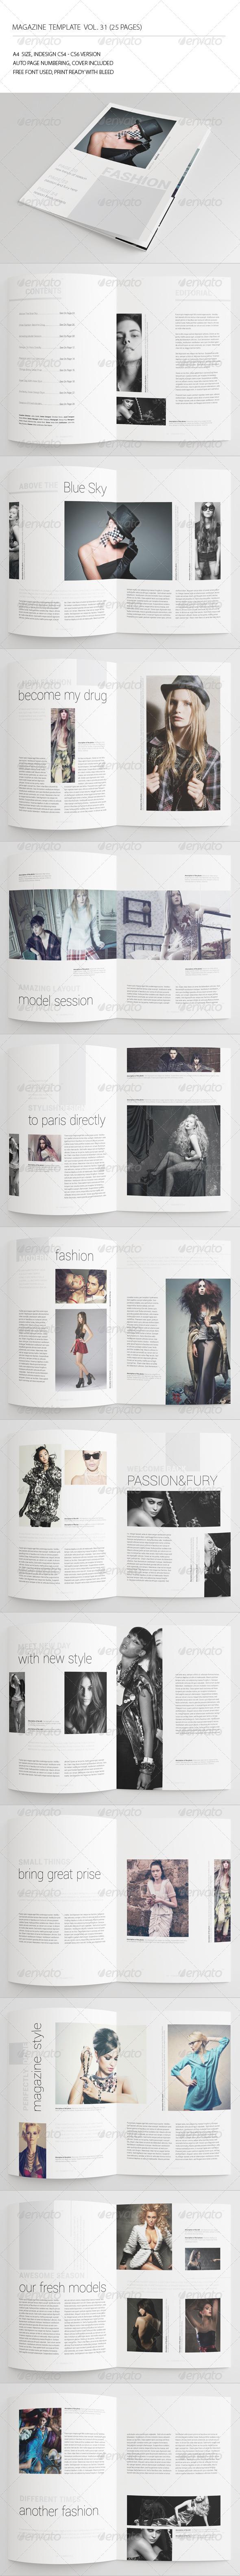 25 Pages Fashion Magazine Vol31 - Magazines Print Templates